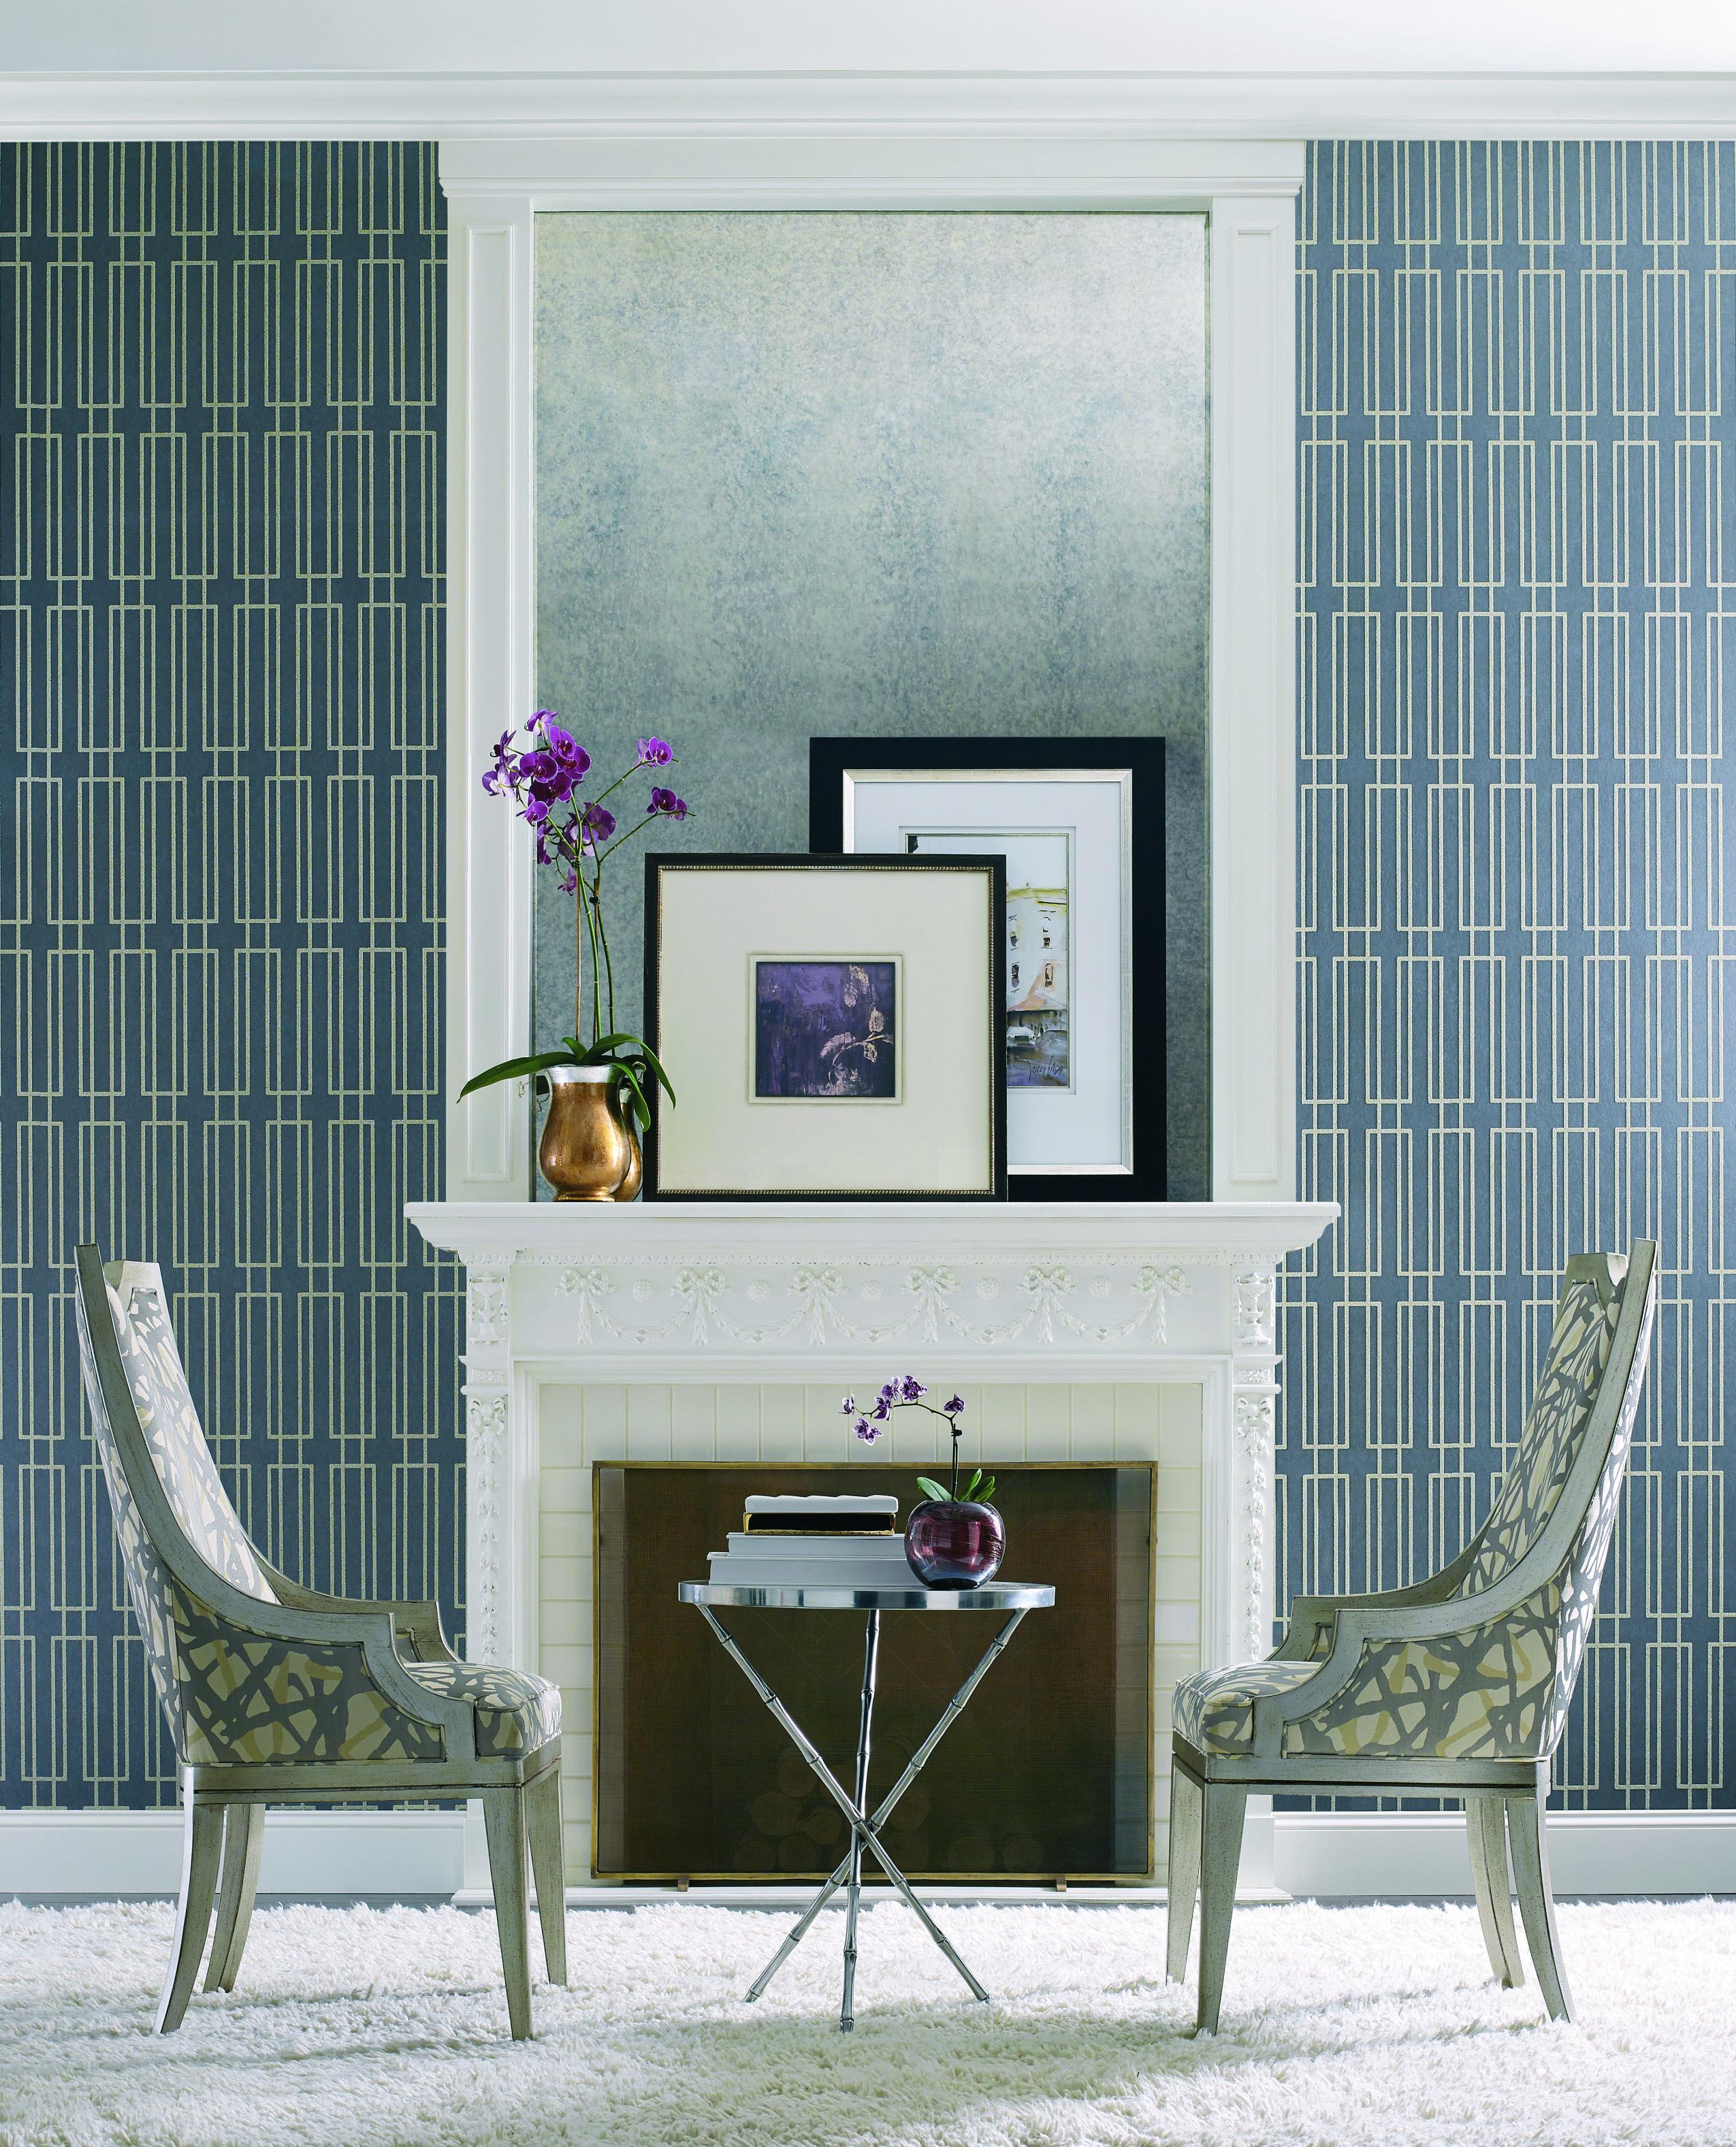 Wallpaper Portodesign Candice Olson Book Modern Artisan Cn 2142 Home Decor Modern Wallpaper Living Room Designs